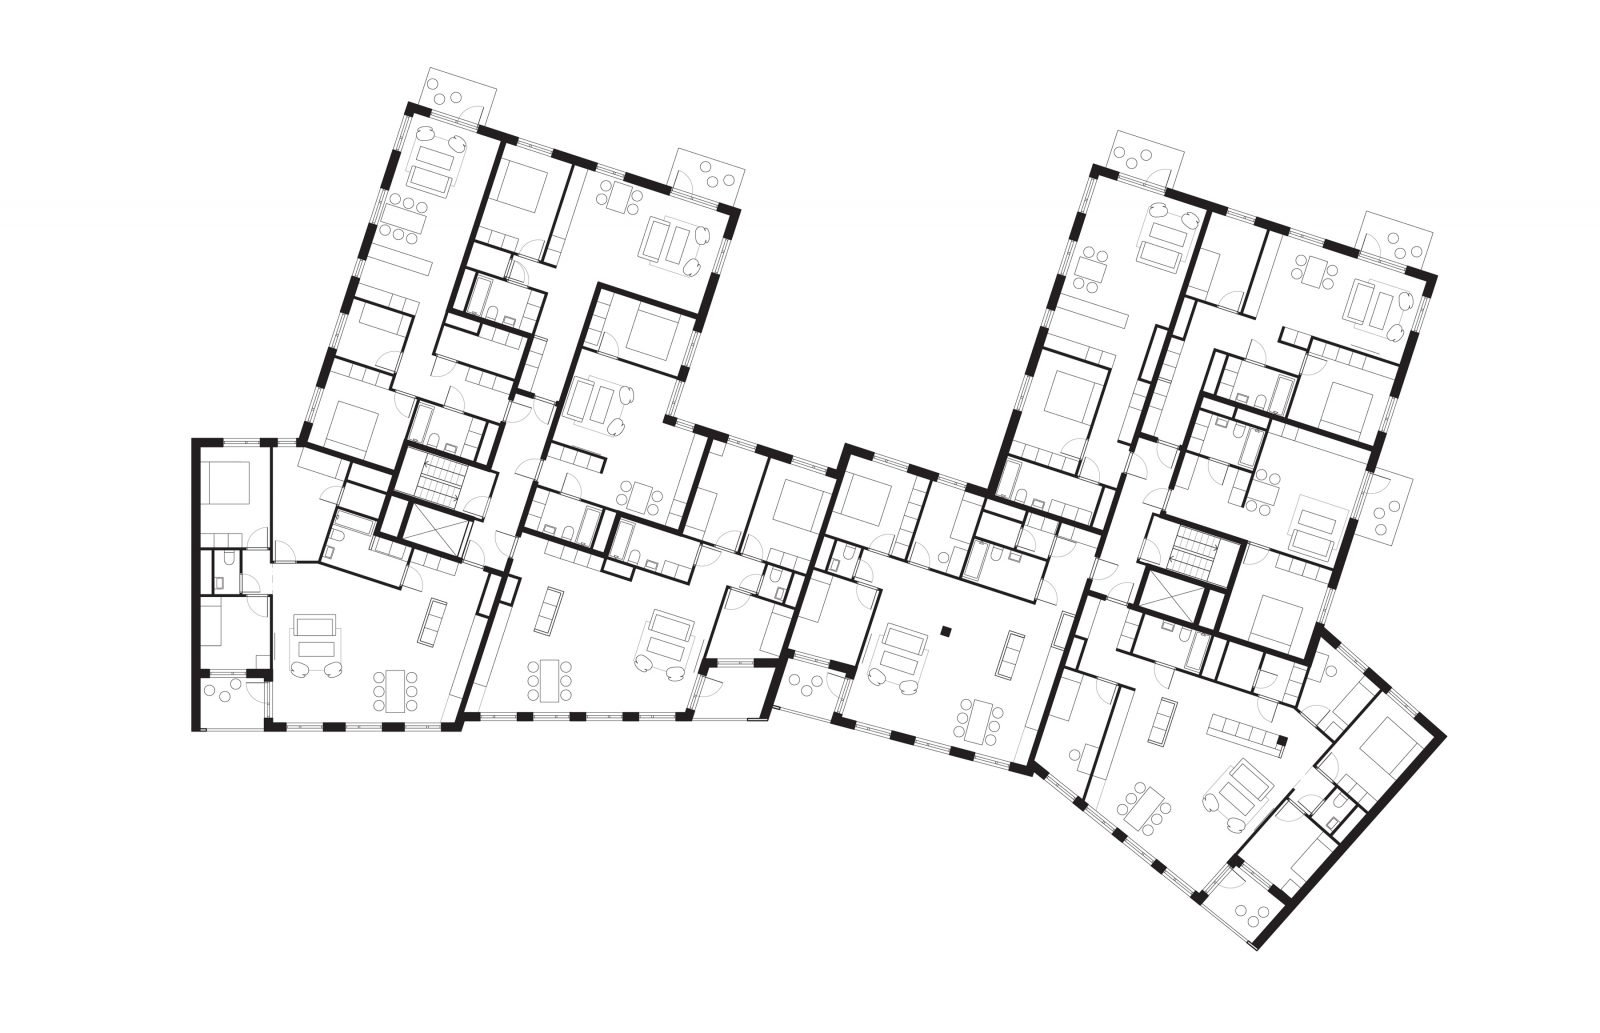 KjellanderSjoberg Etaget typical-plan